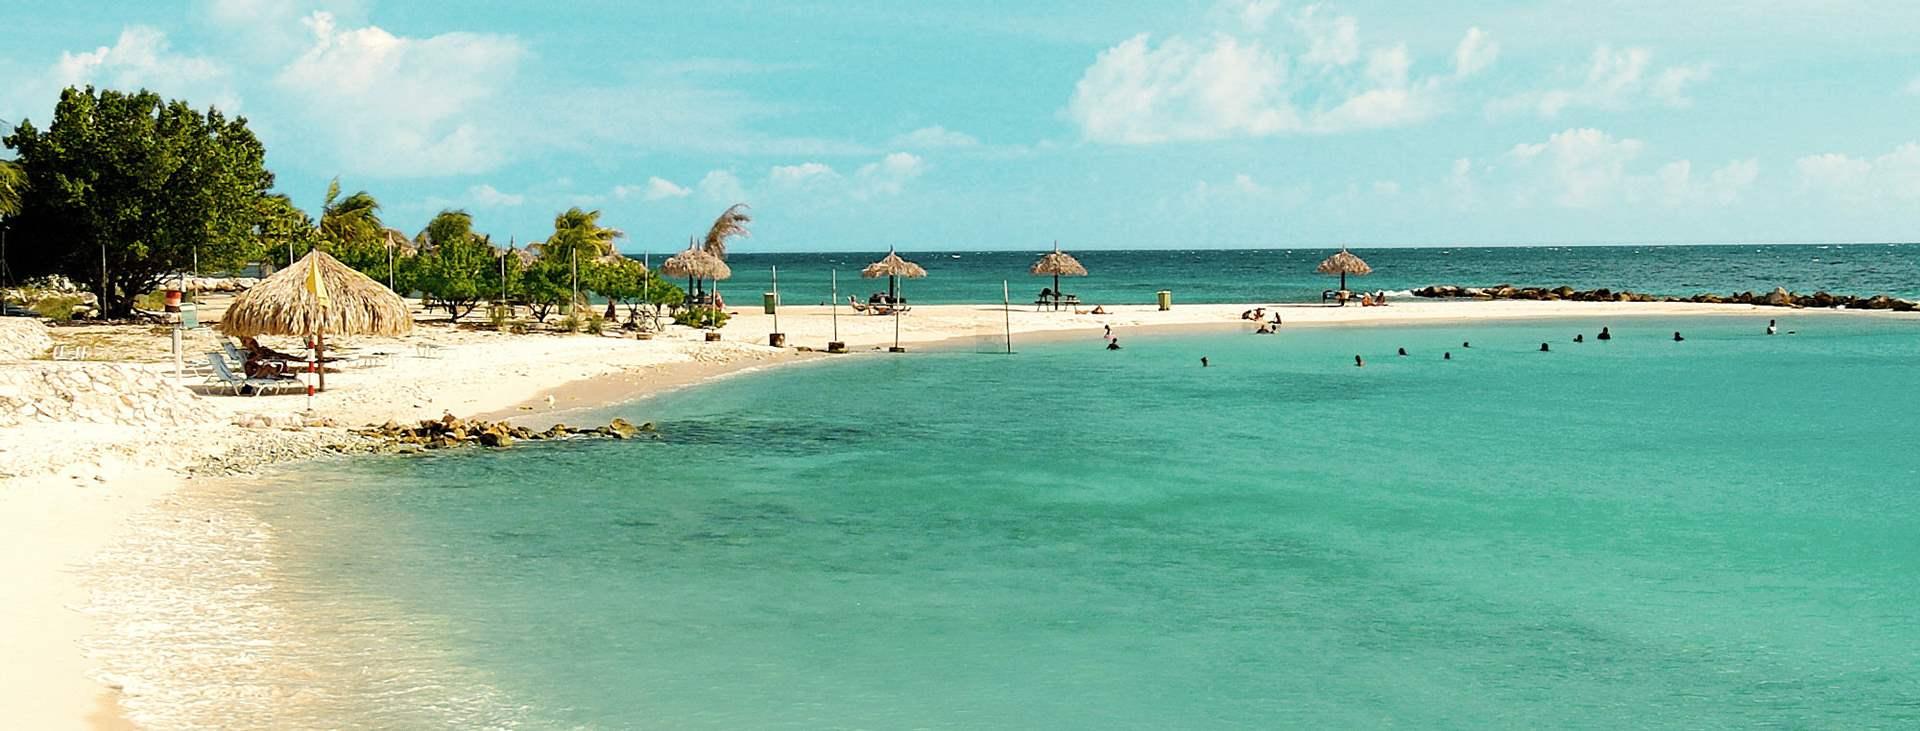 Curaçao on Karibian rytmejä ja valkoisena hohtavia rantoja